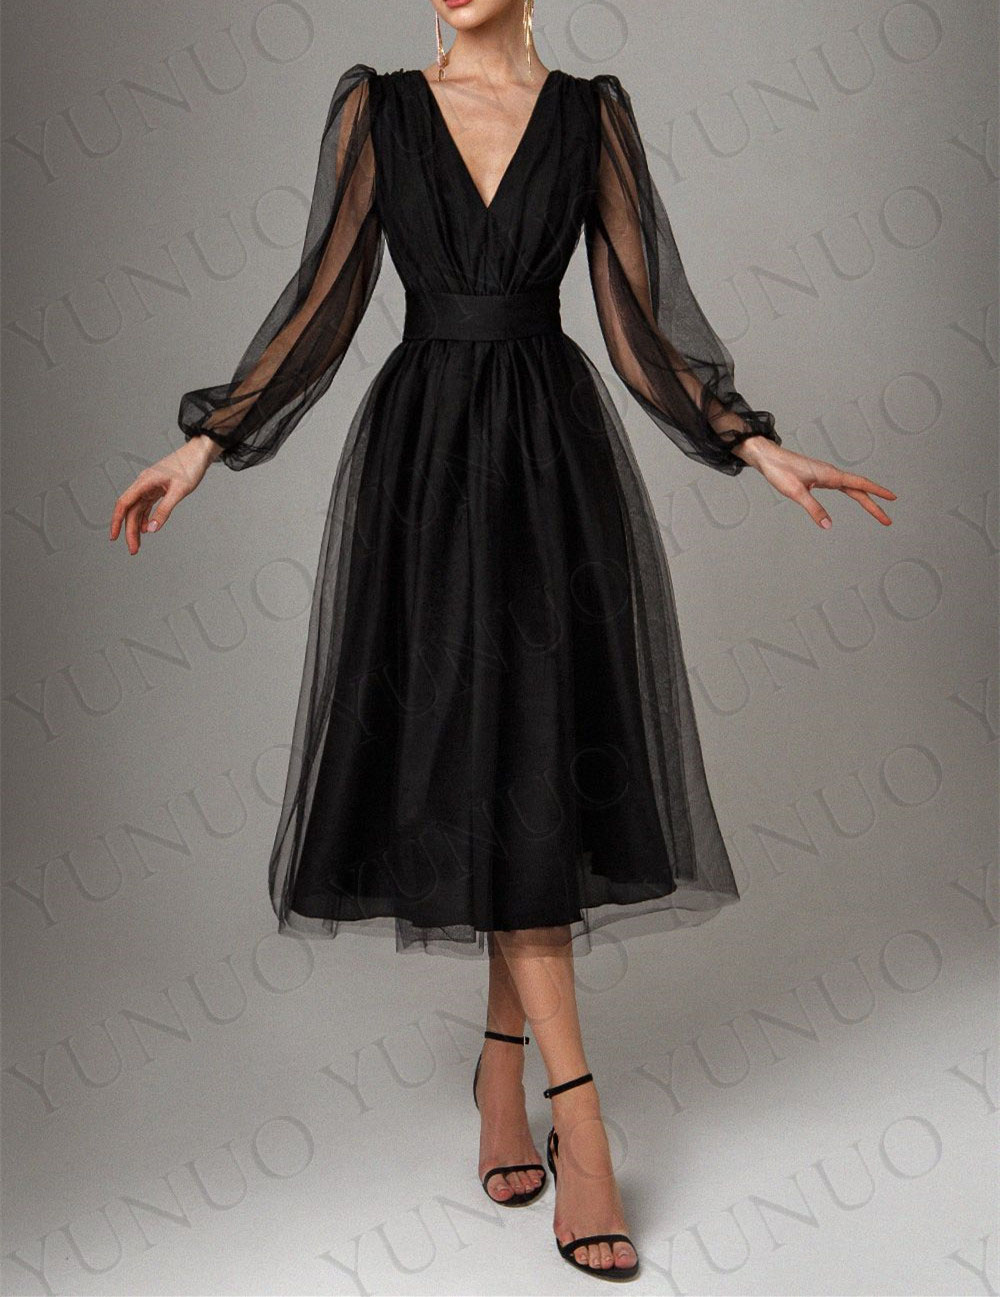 YUNUO Black Long-sleeved Midi Prom Dress robes de cocktail V Neck Back Tulle платье на выпускной فساتين السهرة Evening Dresses